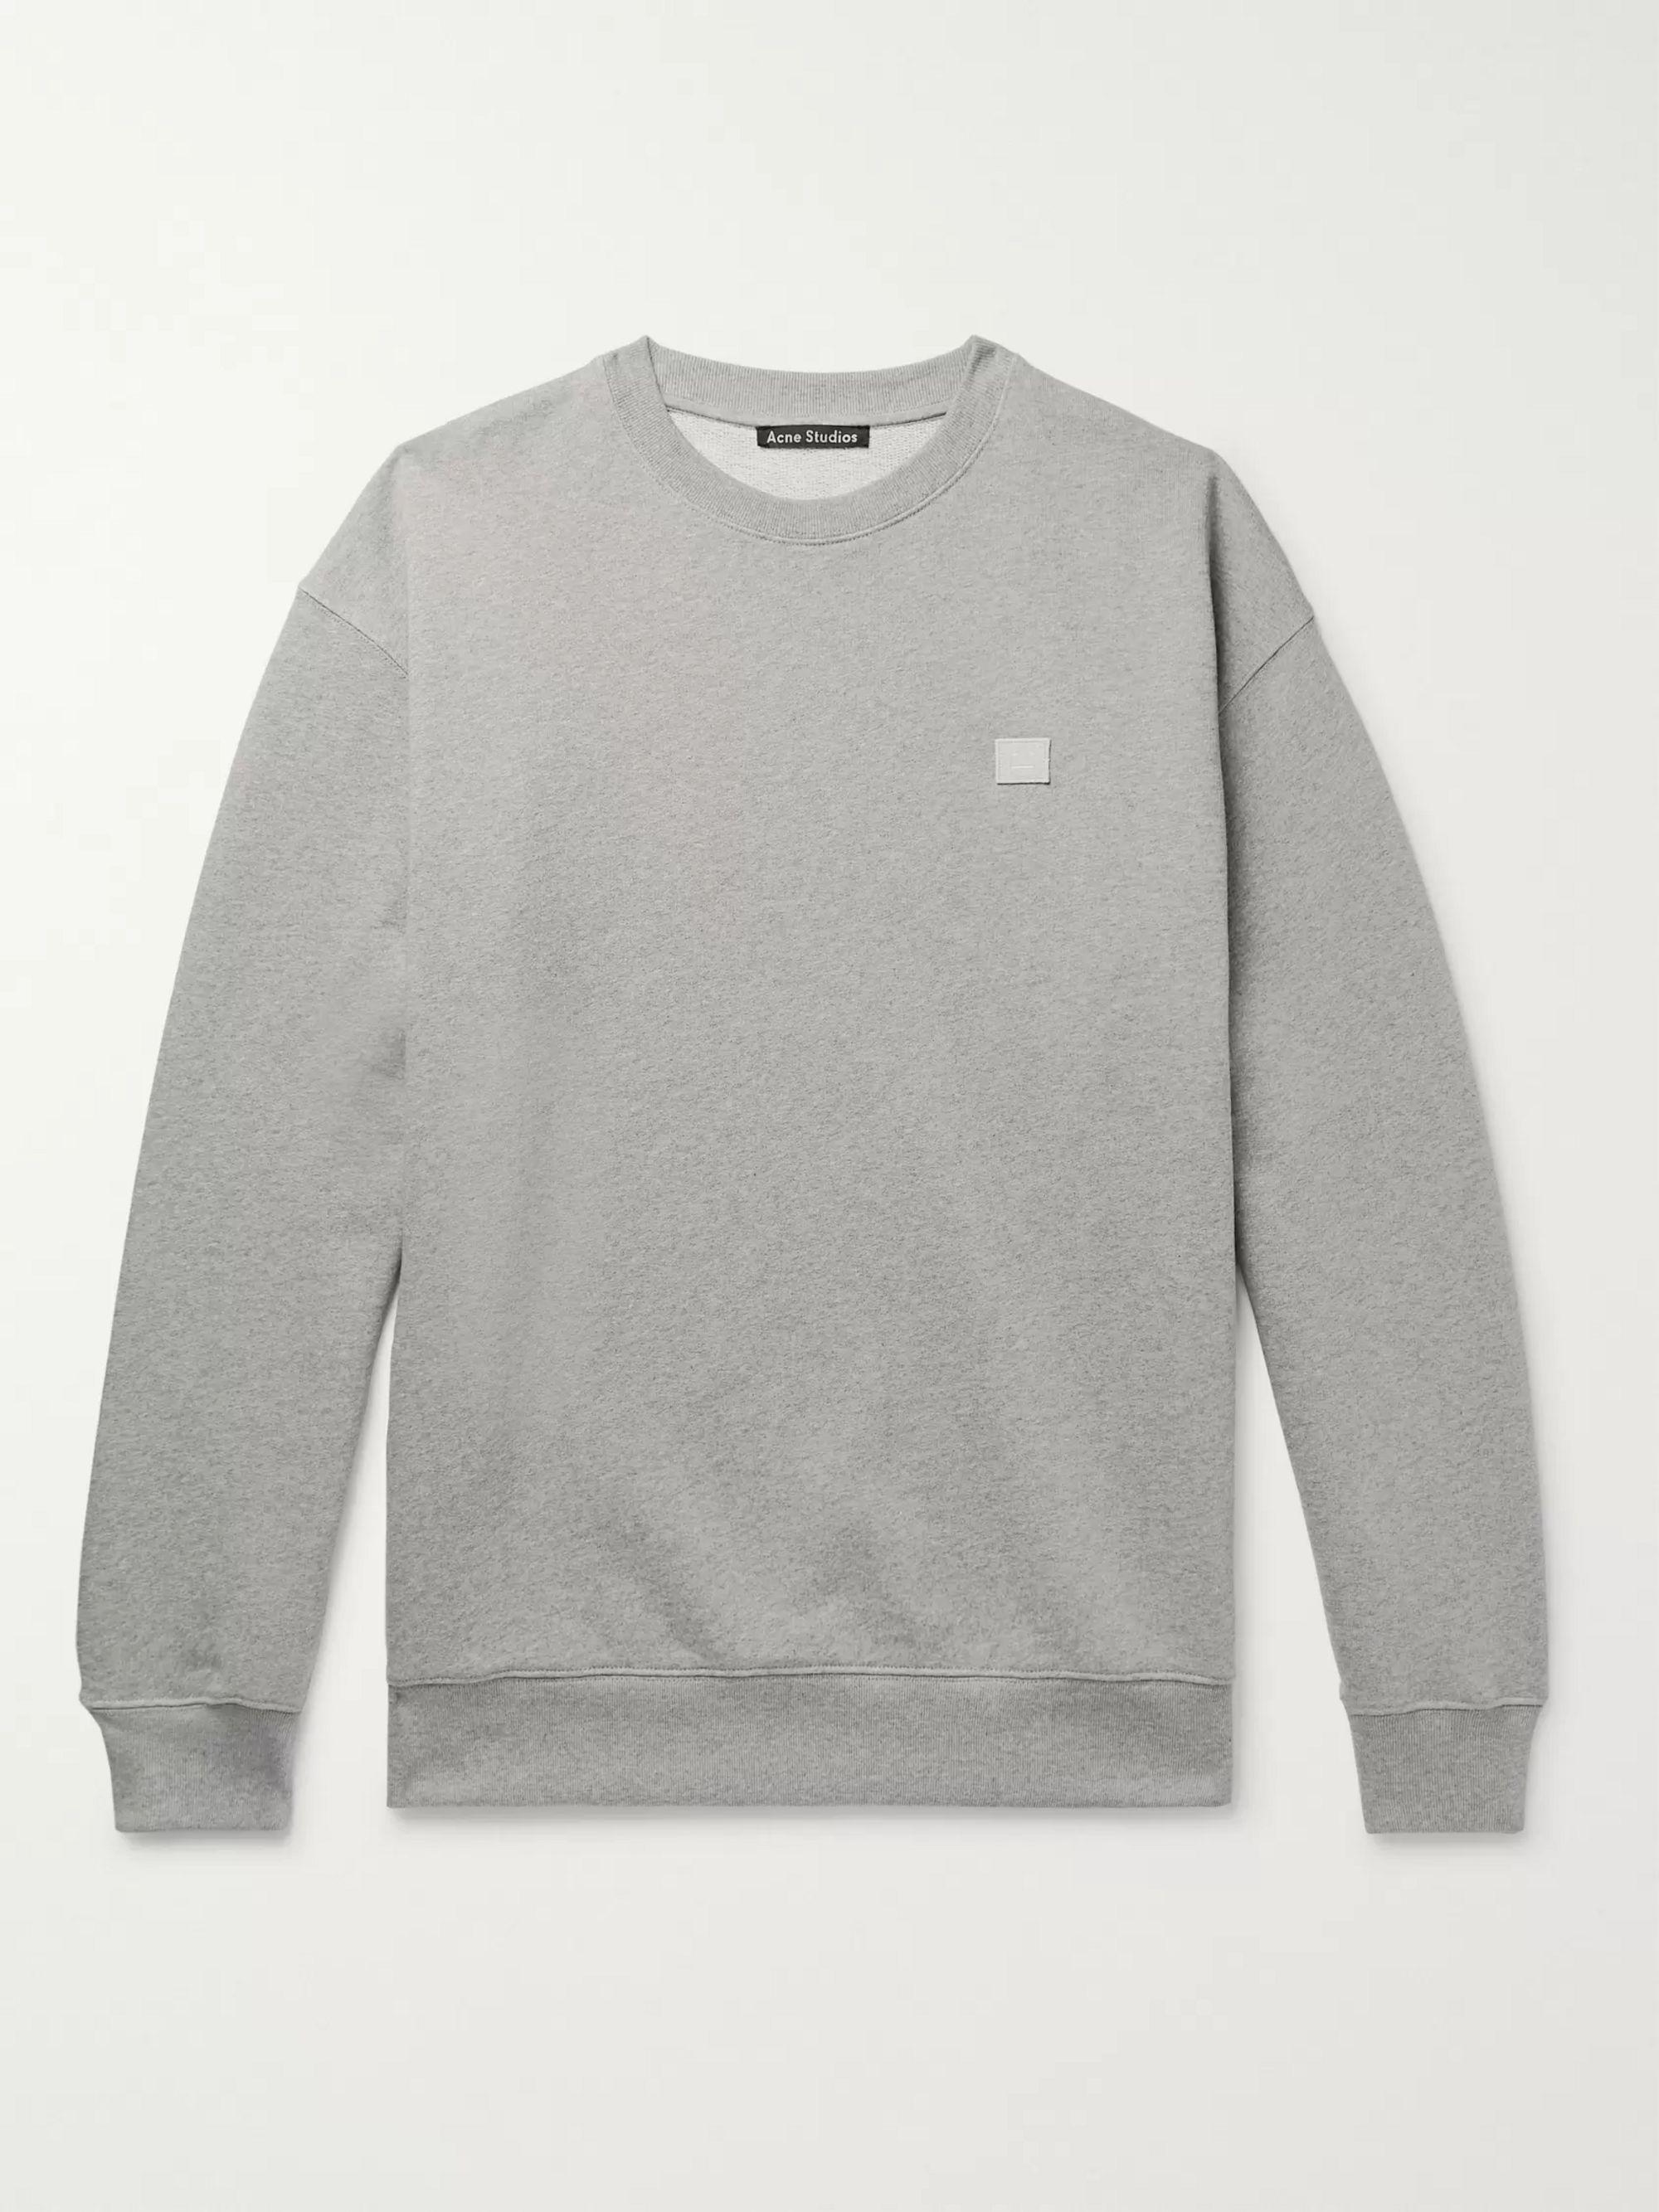 Forba Oversized Logo Appliquéd Mélange Loopback Cotton Jersey Sweatshirt